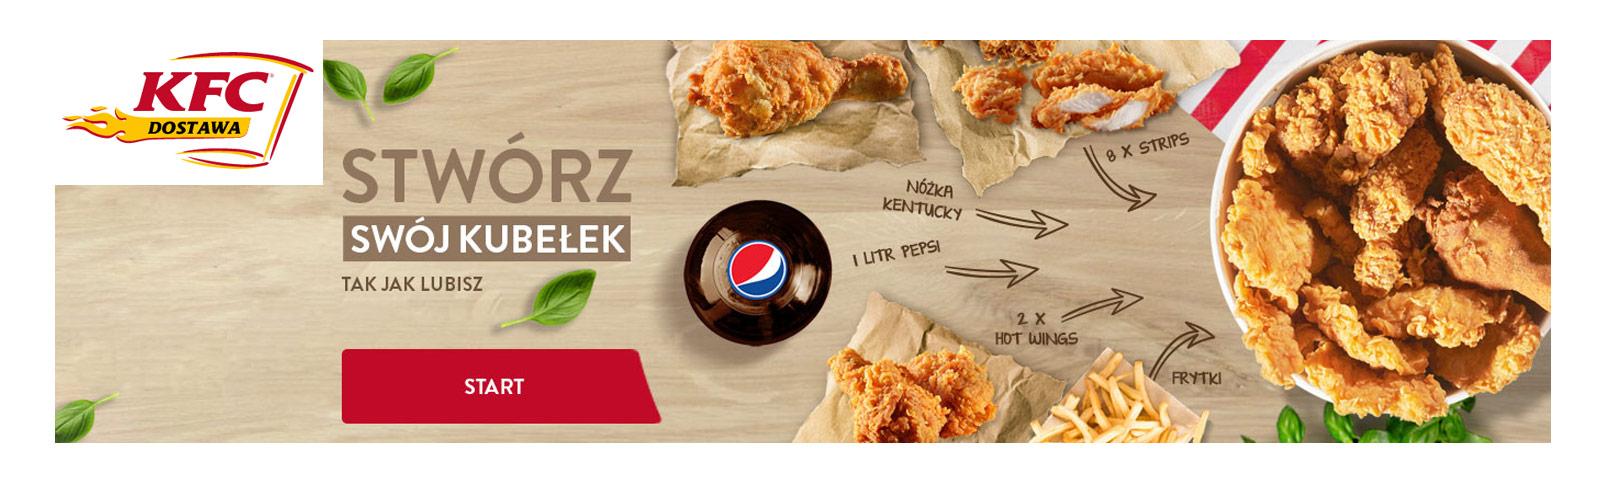 KFC dostawa kupony rabatowe